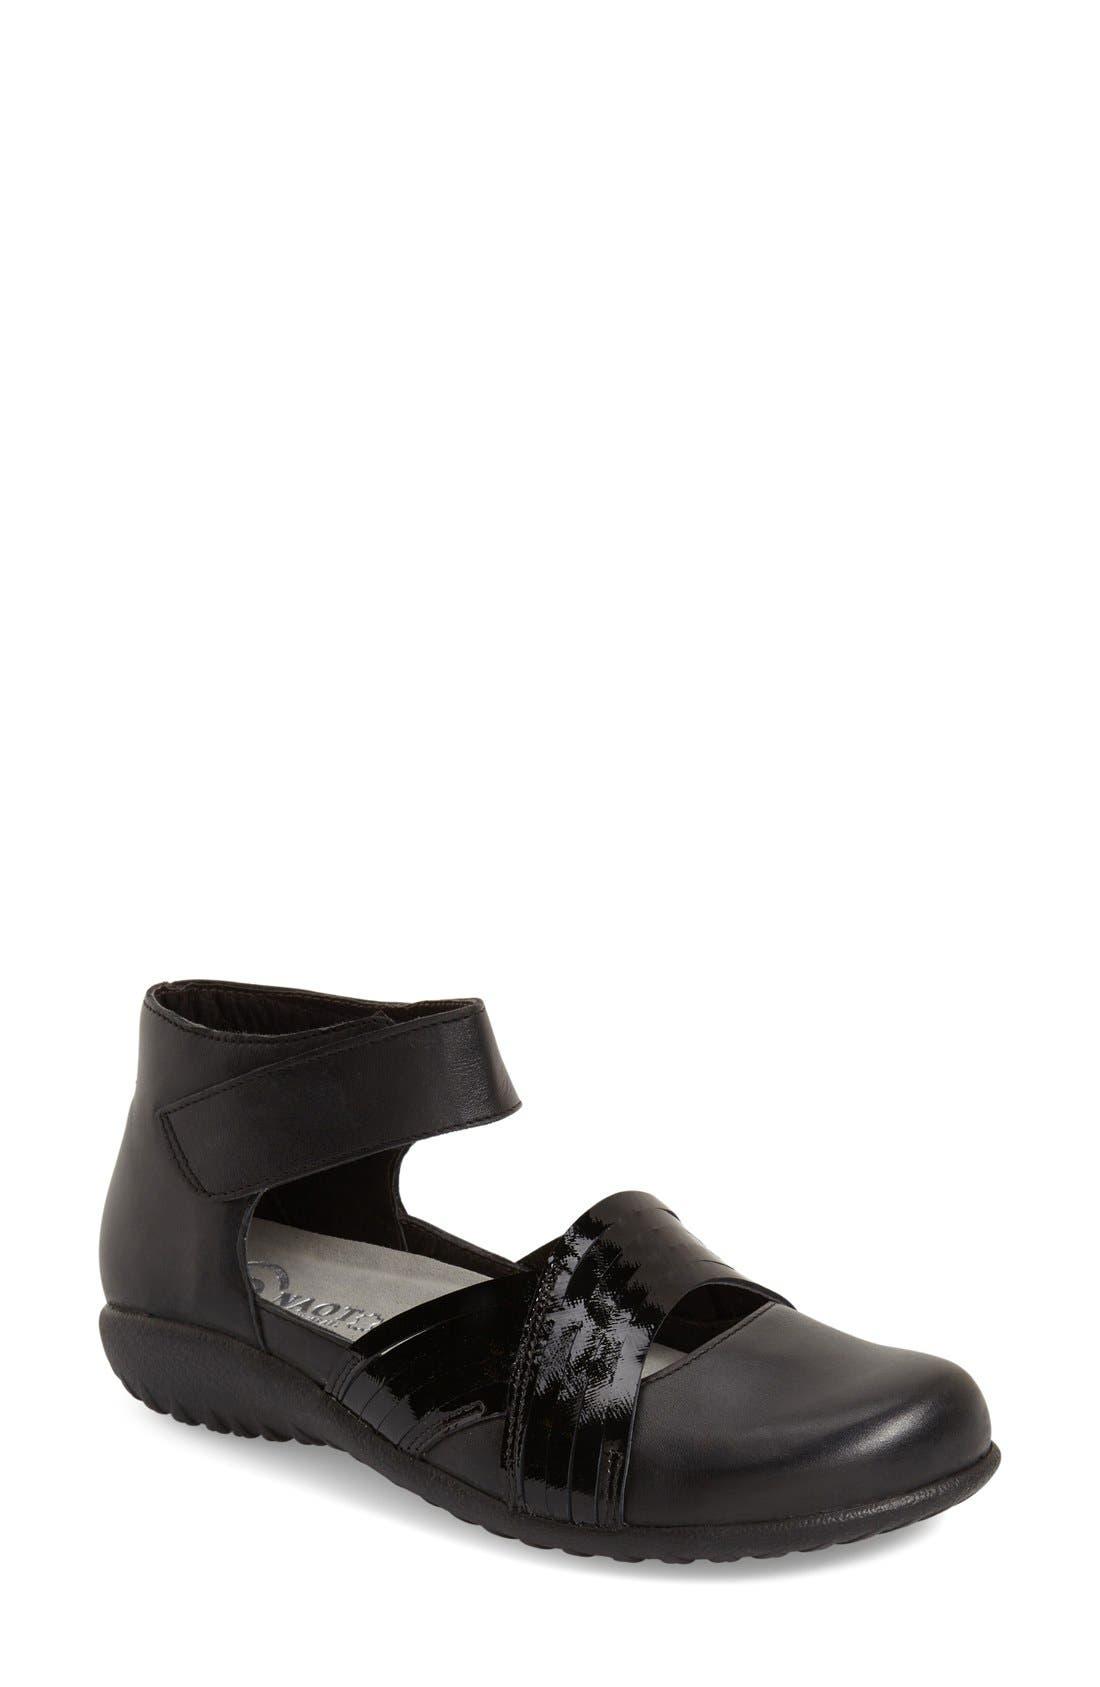 NAOT 'Tenei' Ankle Strap Flat